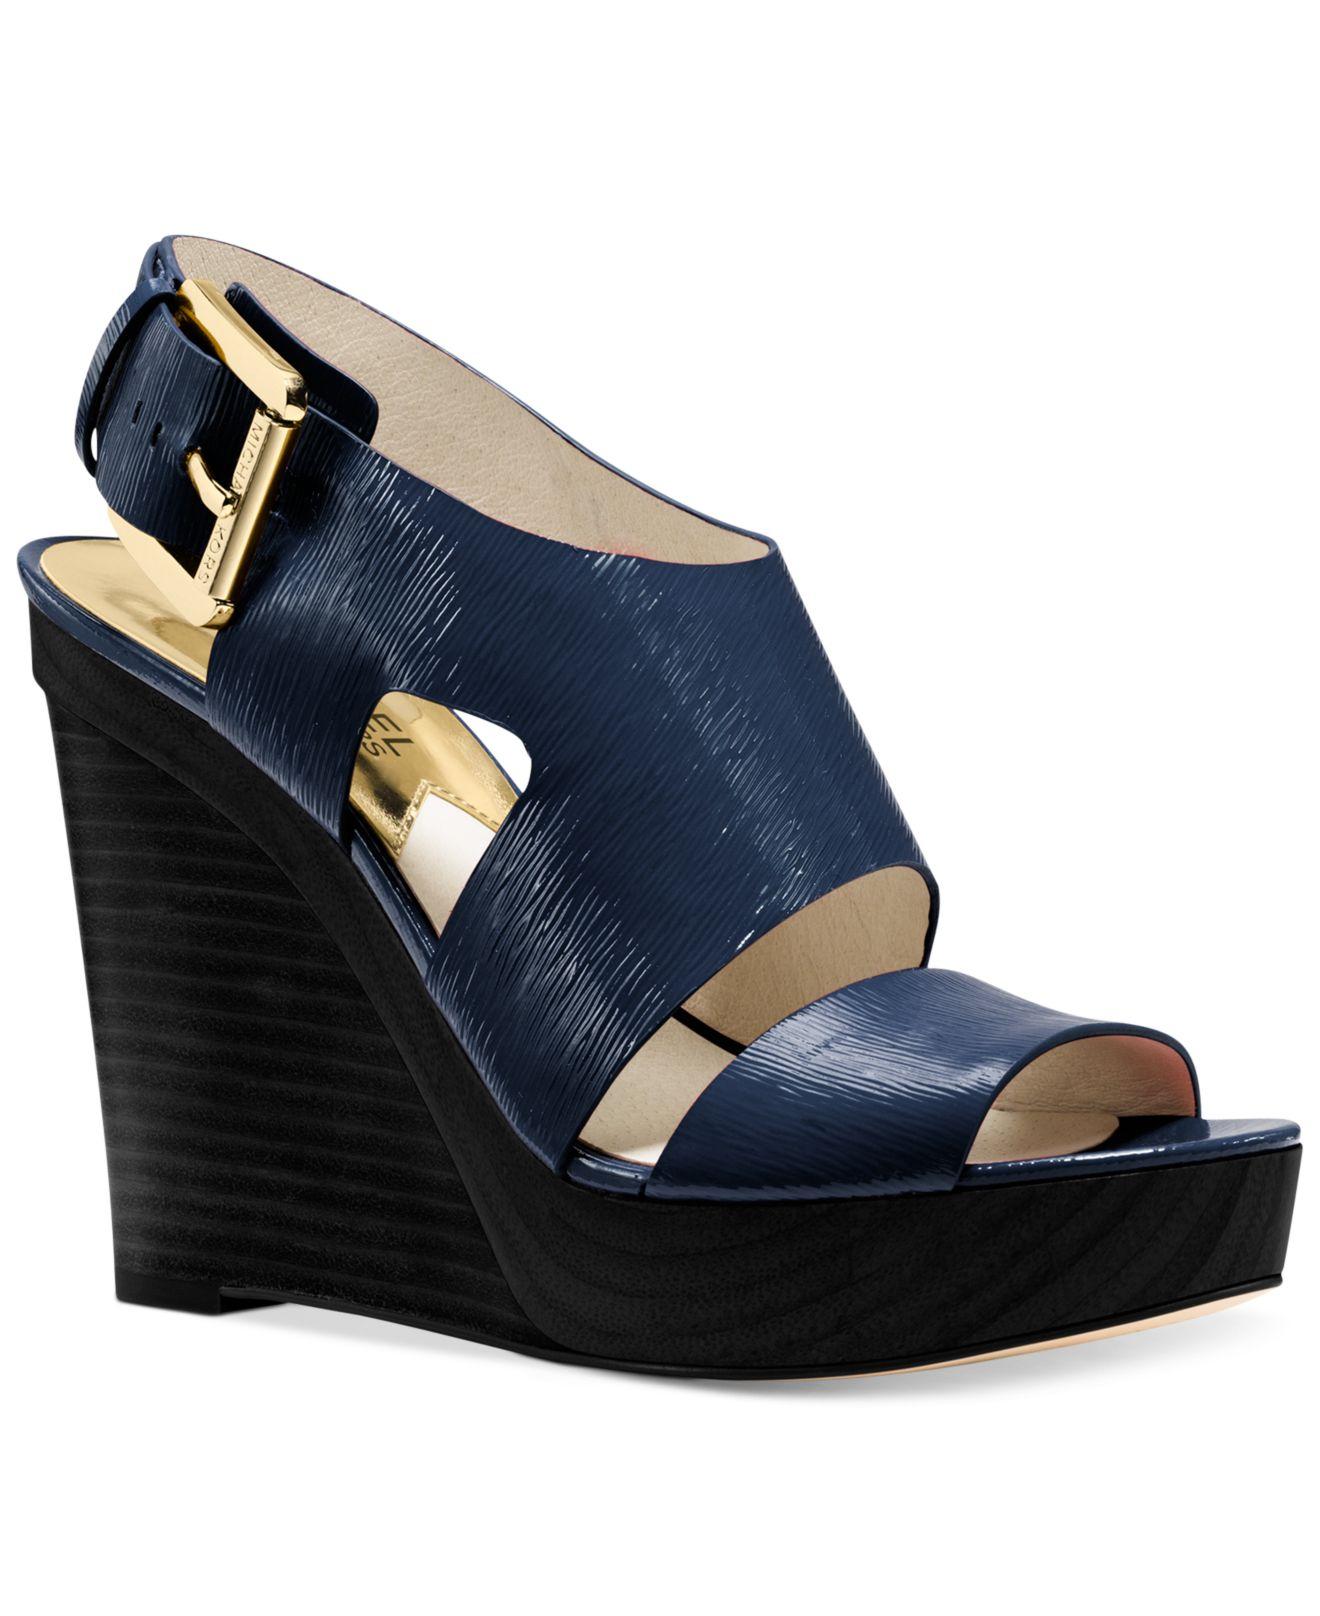 bb977f16265cb Lyst - Michael Kors Michael Carla Platform Wedge Sandals in Blue